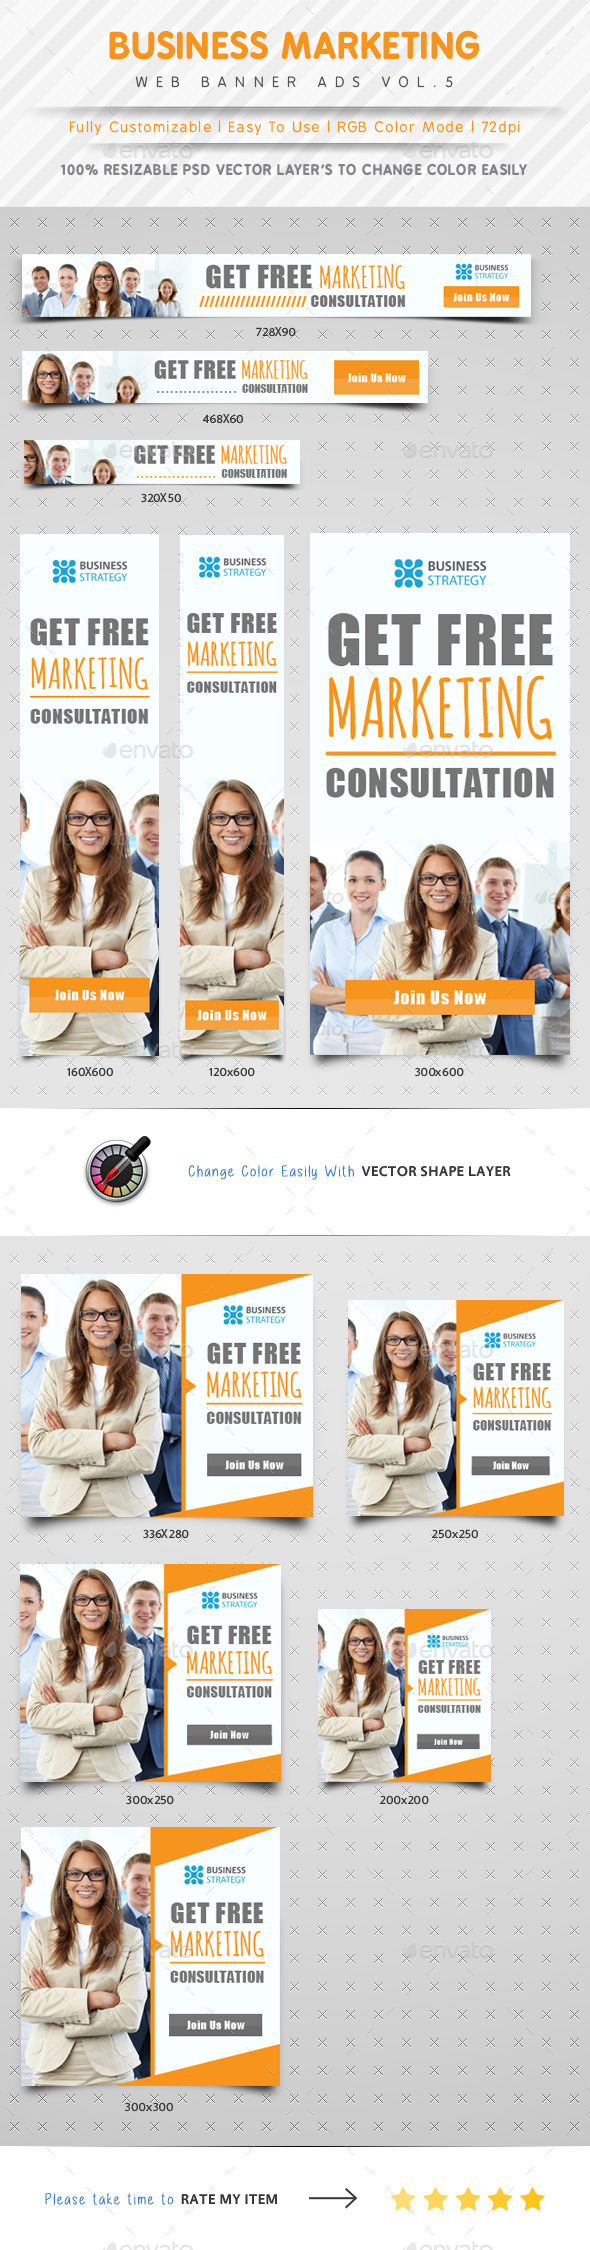 GraphicRiver Business Marketing Web Banner Ads Vol.5 10299288